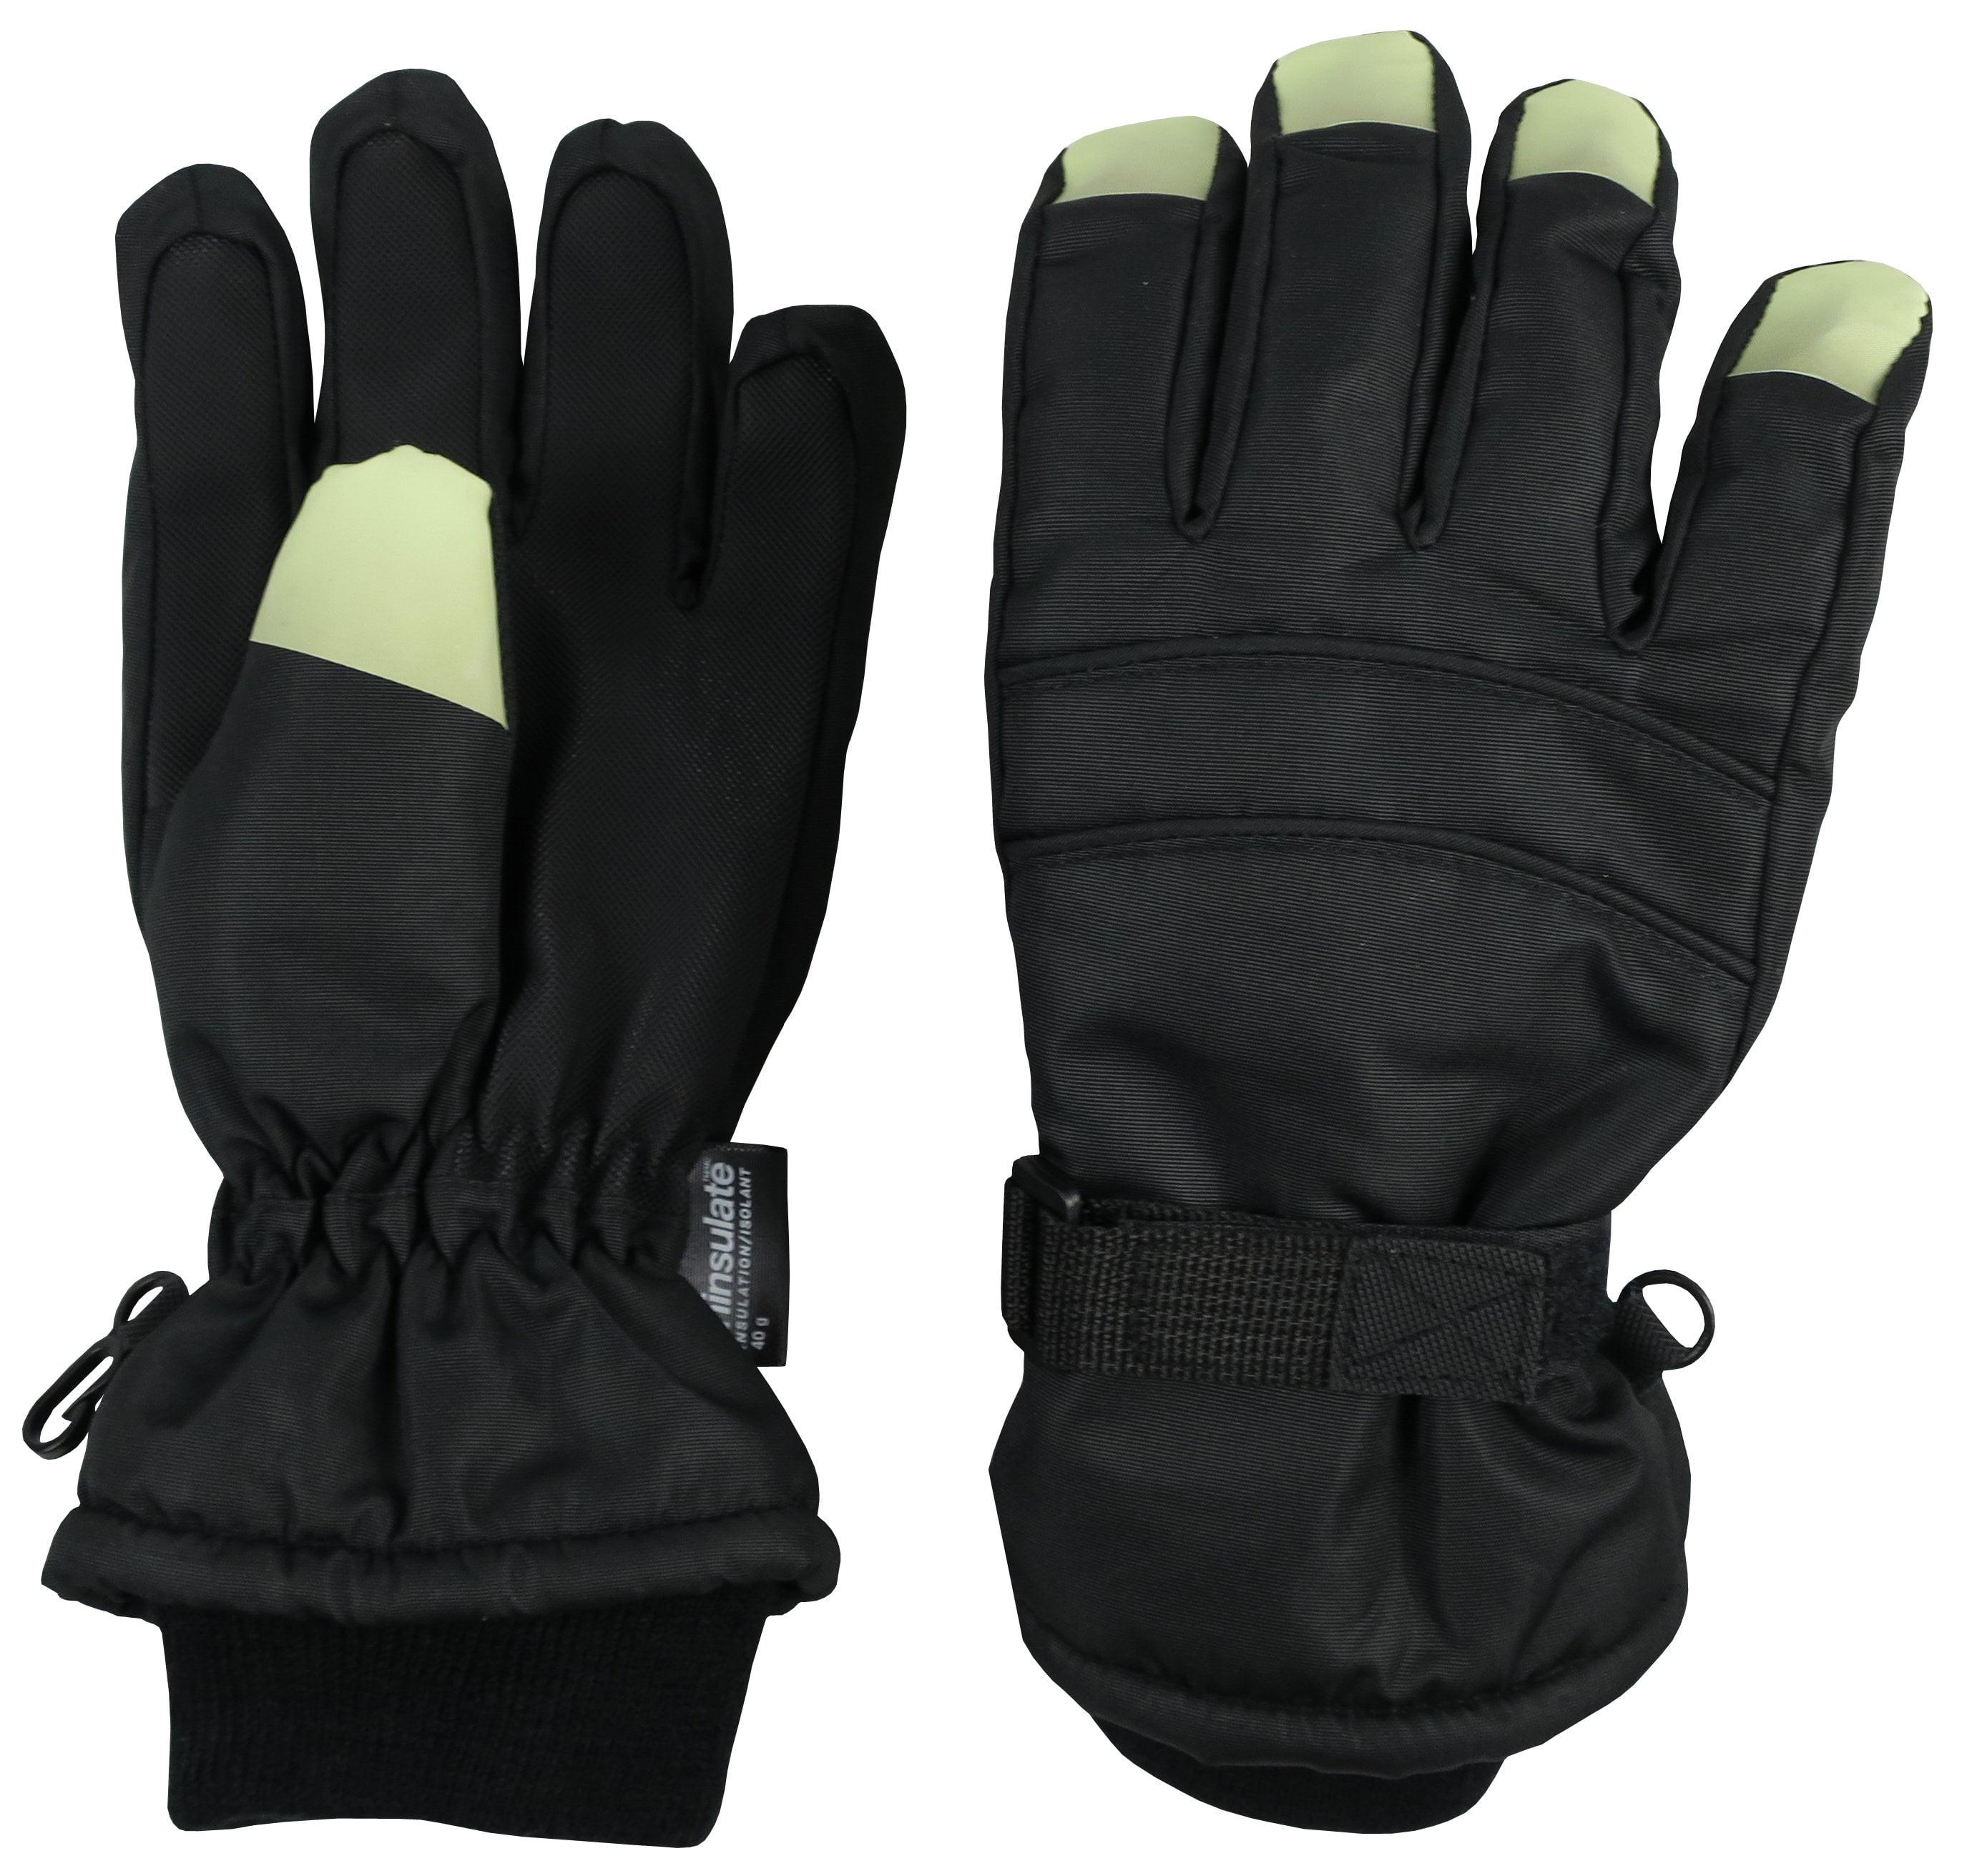 NIce Caps Girls Waterproof Thinsulate Fashion Design Winter Snow Ski Gloves